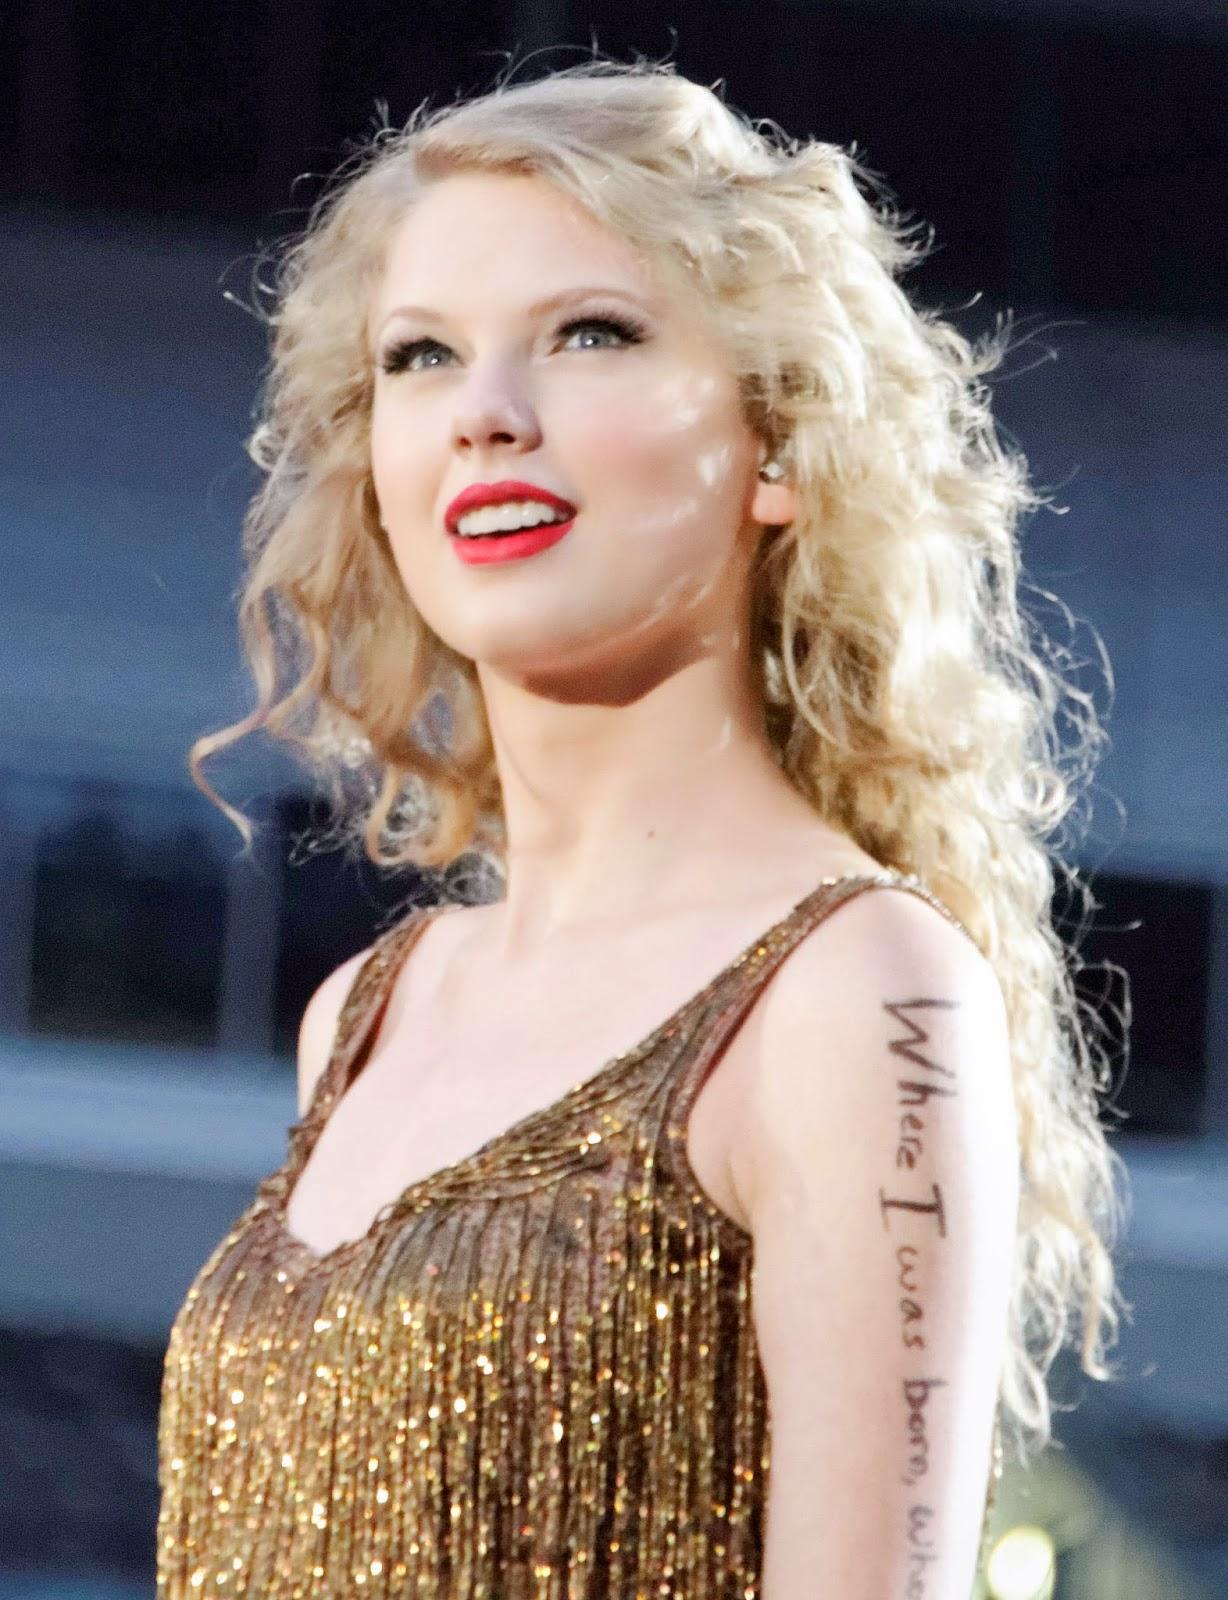 Taylor Swift In Vogue Magazine Australia November 2015: Taylor Swift Profile And Latest Photos 2013-14